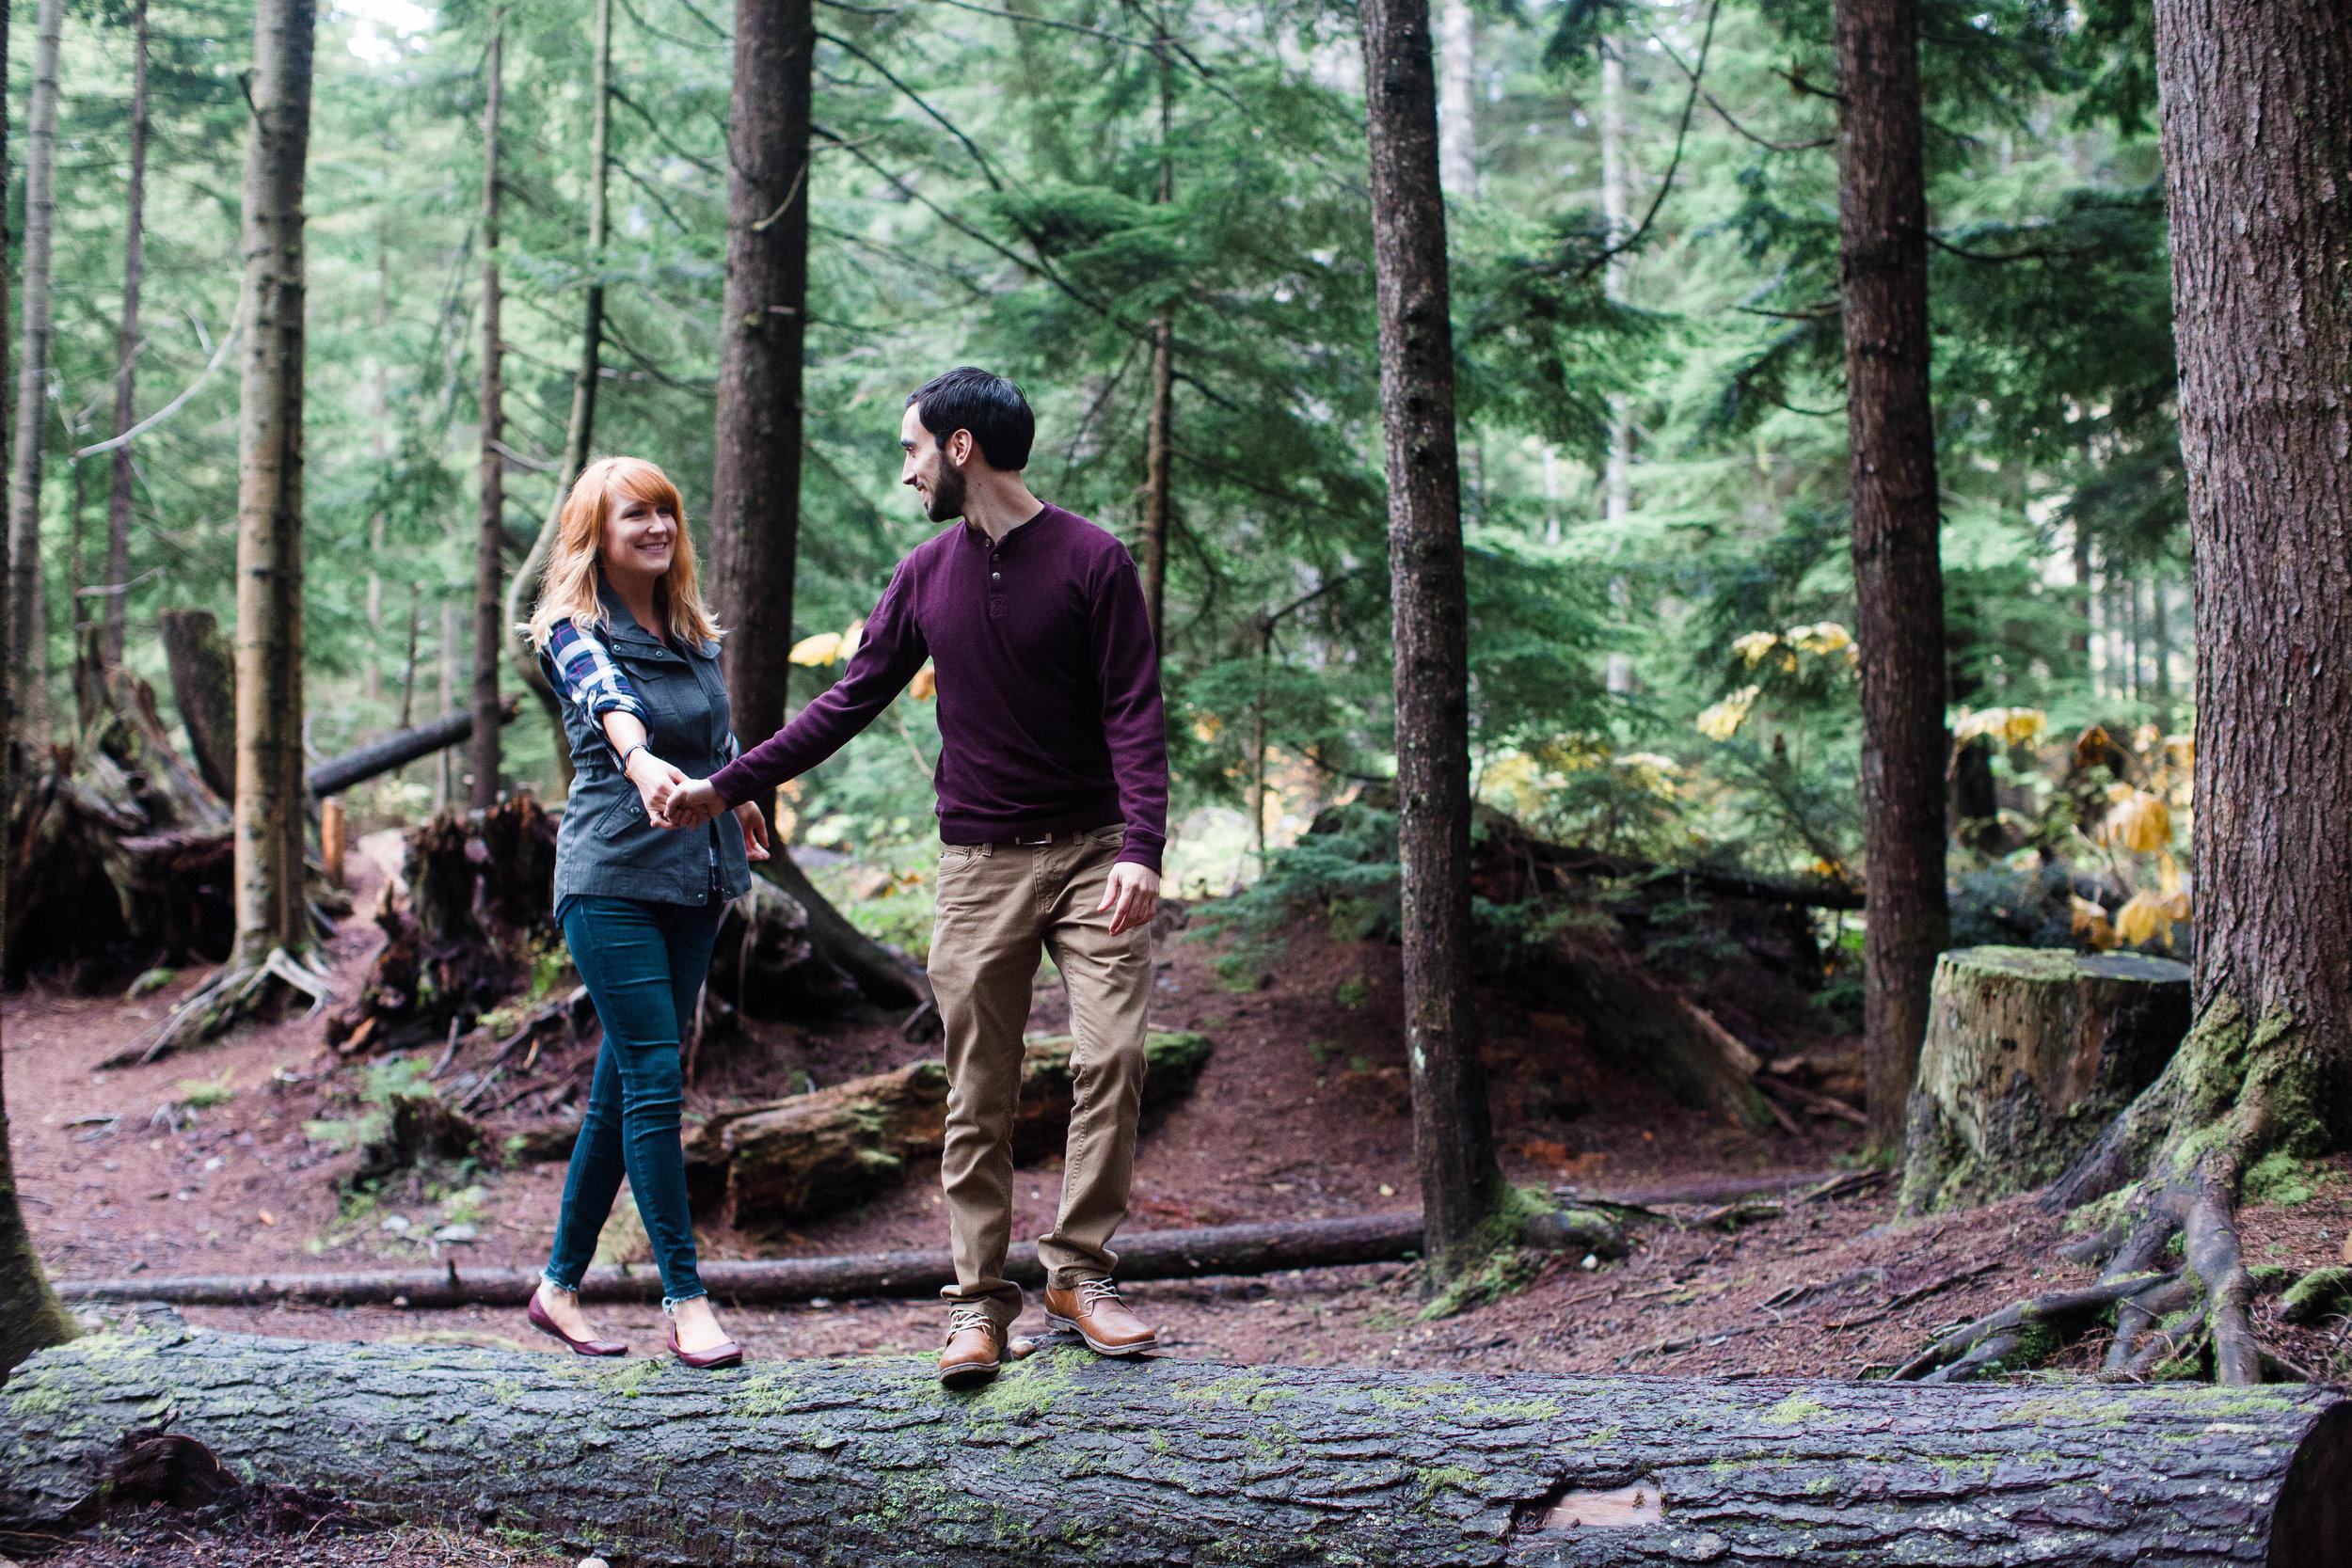 Ryan+Nicole_Franklin+Falls+Engagement_APW2016_26.JPG